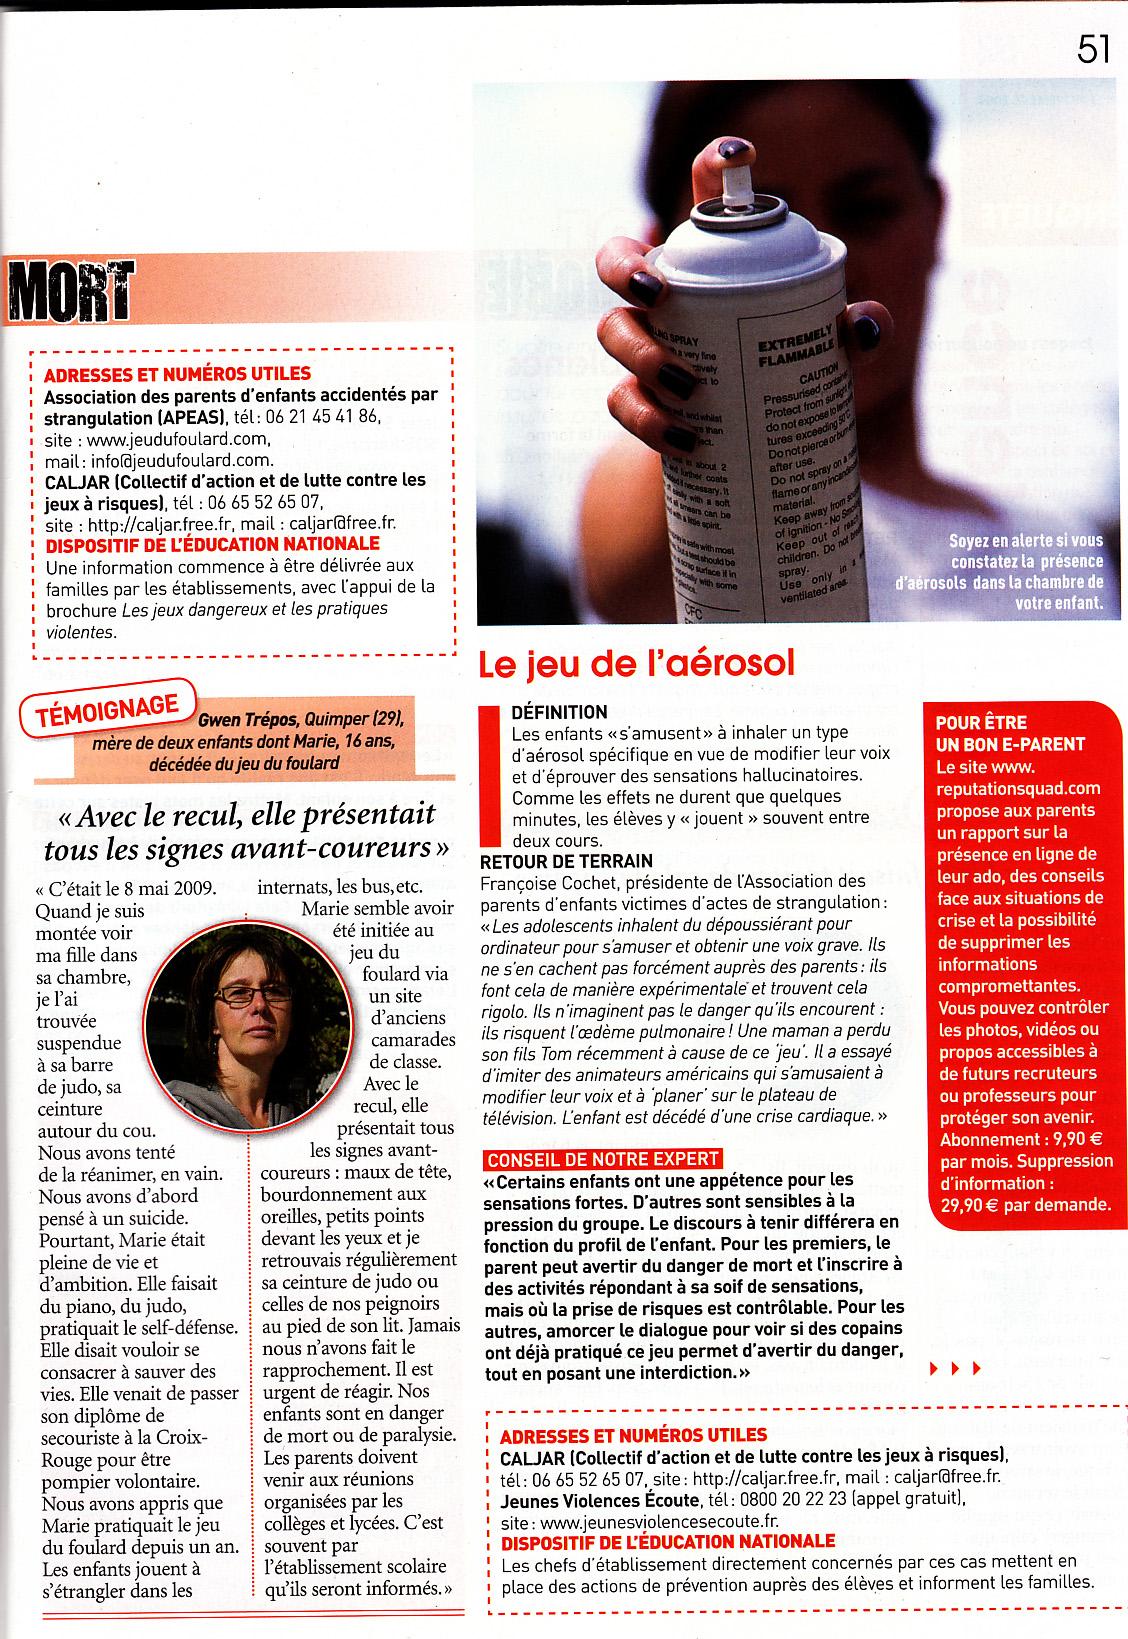 2009 11 Pédagogie Magazine p 51